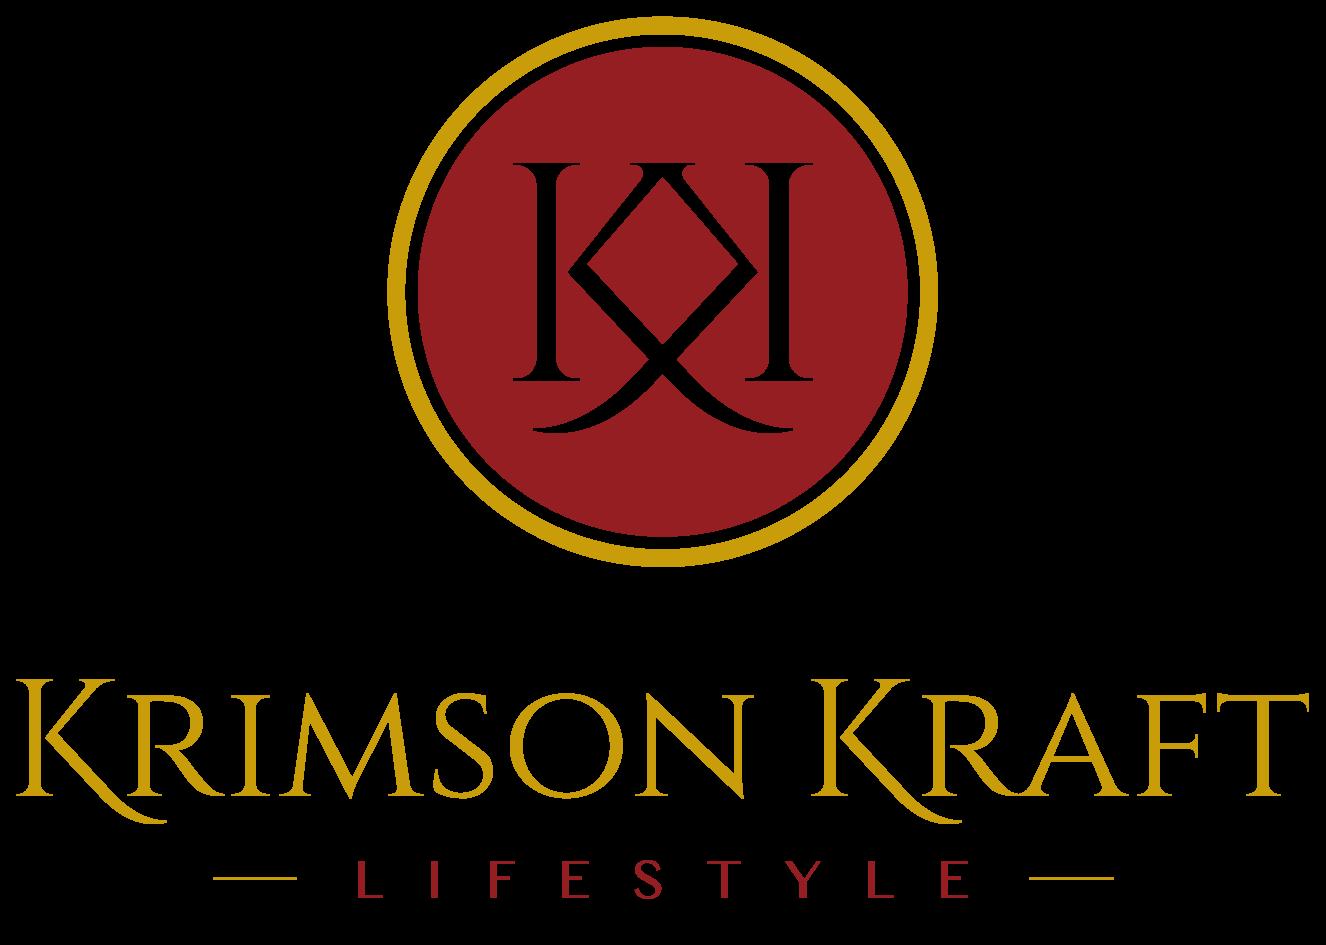 Krimson Kraft Lifestyle